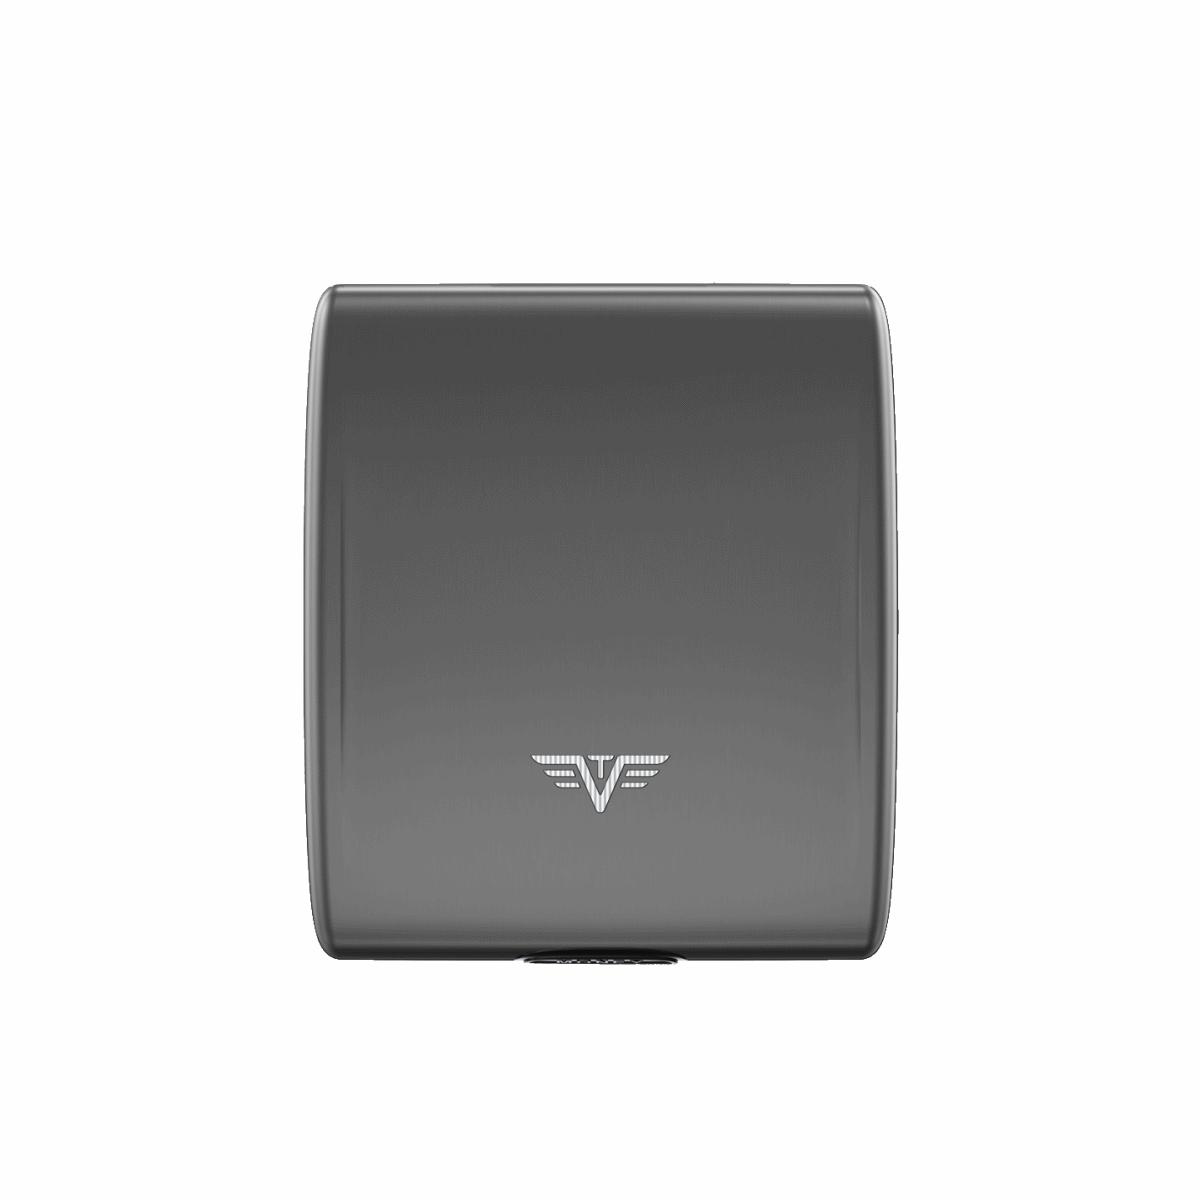 TRU VIRTU Aluminum Wallet Beluga - Money & Cards - Taupe